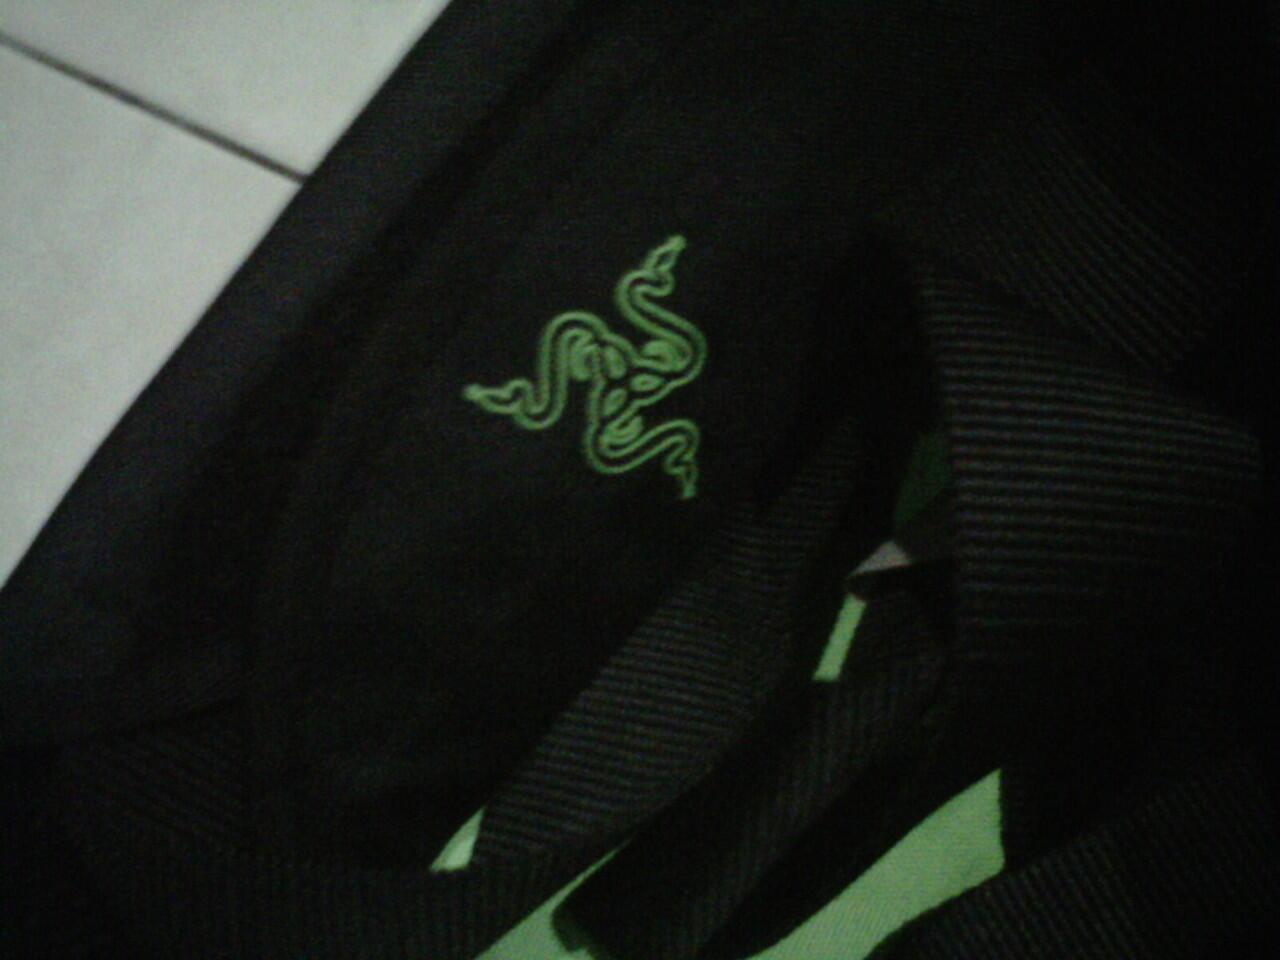 [MVPcomp] Limited Stock ORIGINAL Razer MessengerSling Bag, Tas Samping Razer BNIB